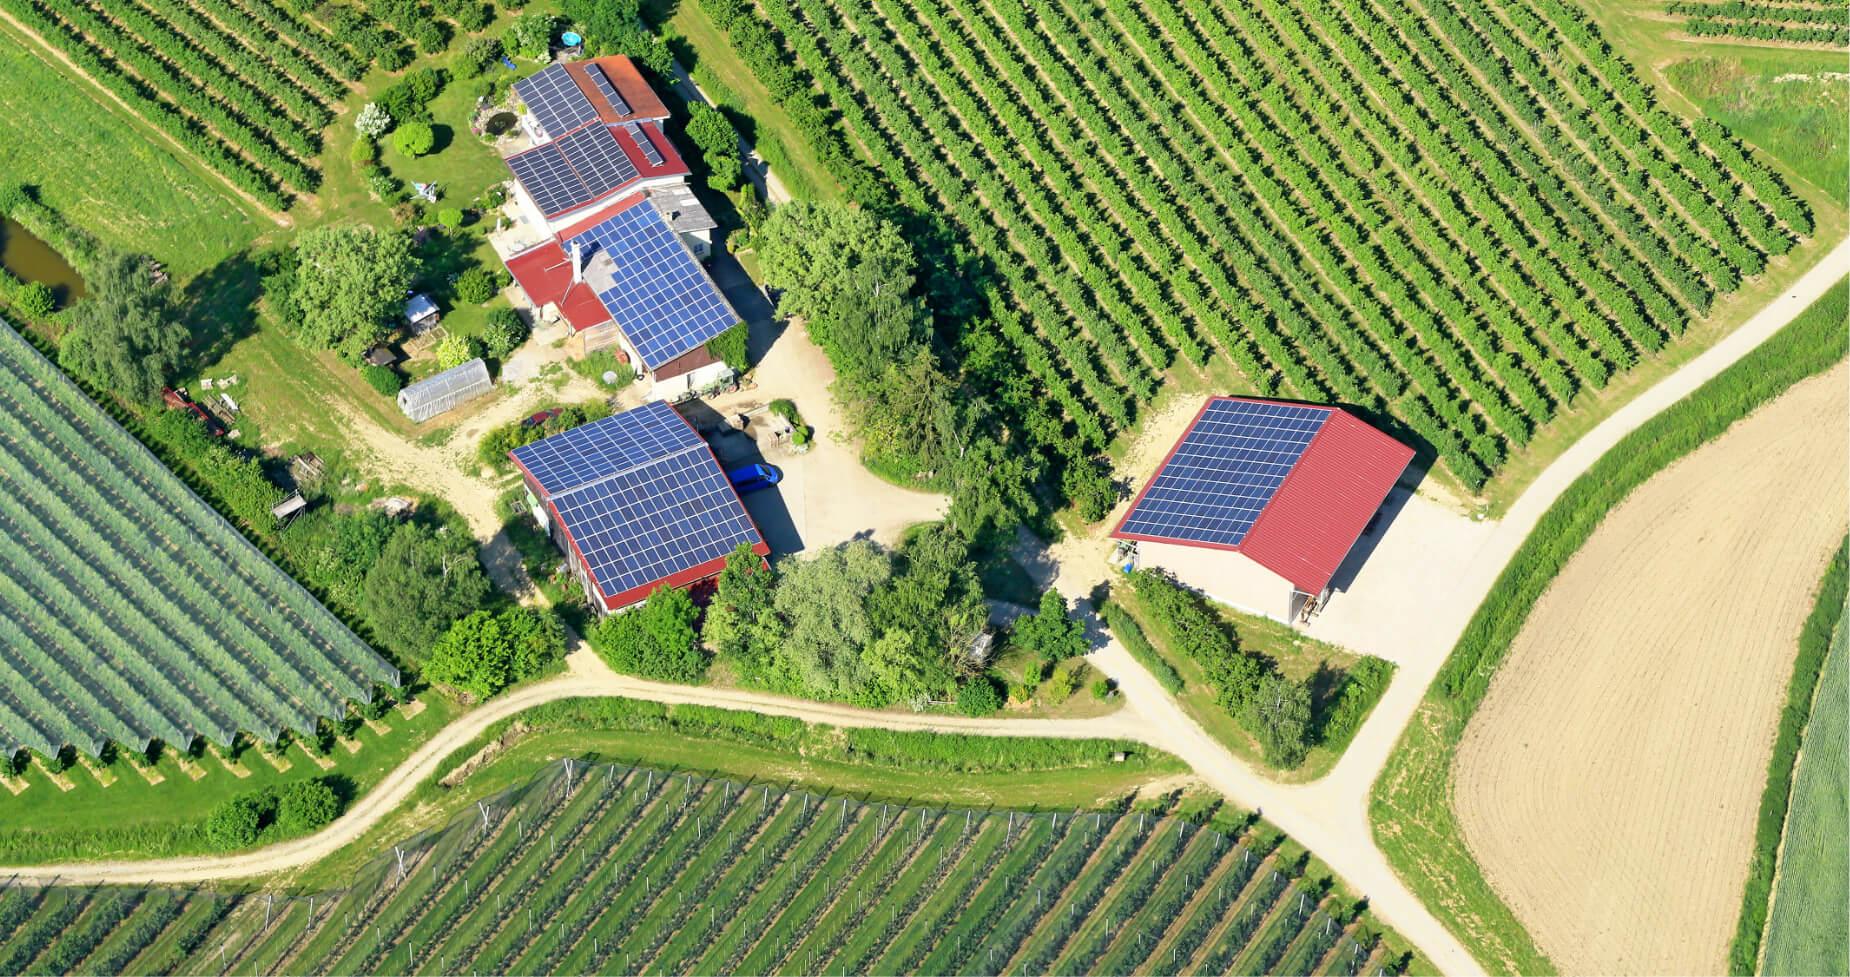 Casas de campo con placas solares fotovoltaicas.